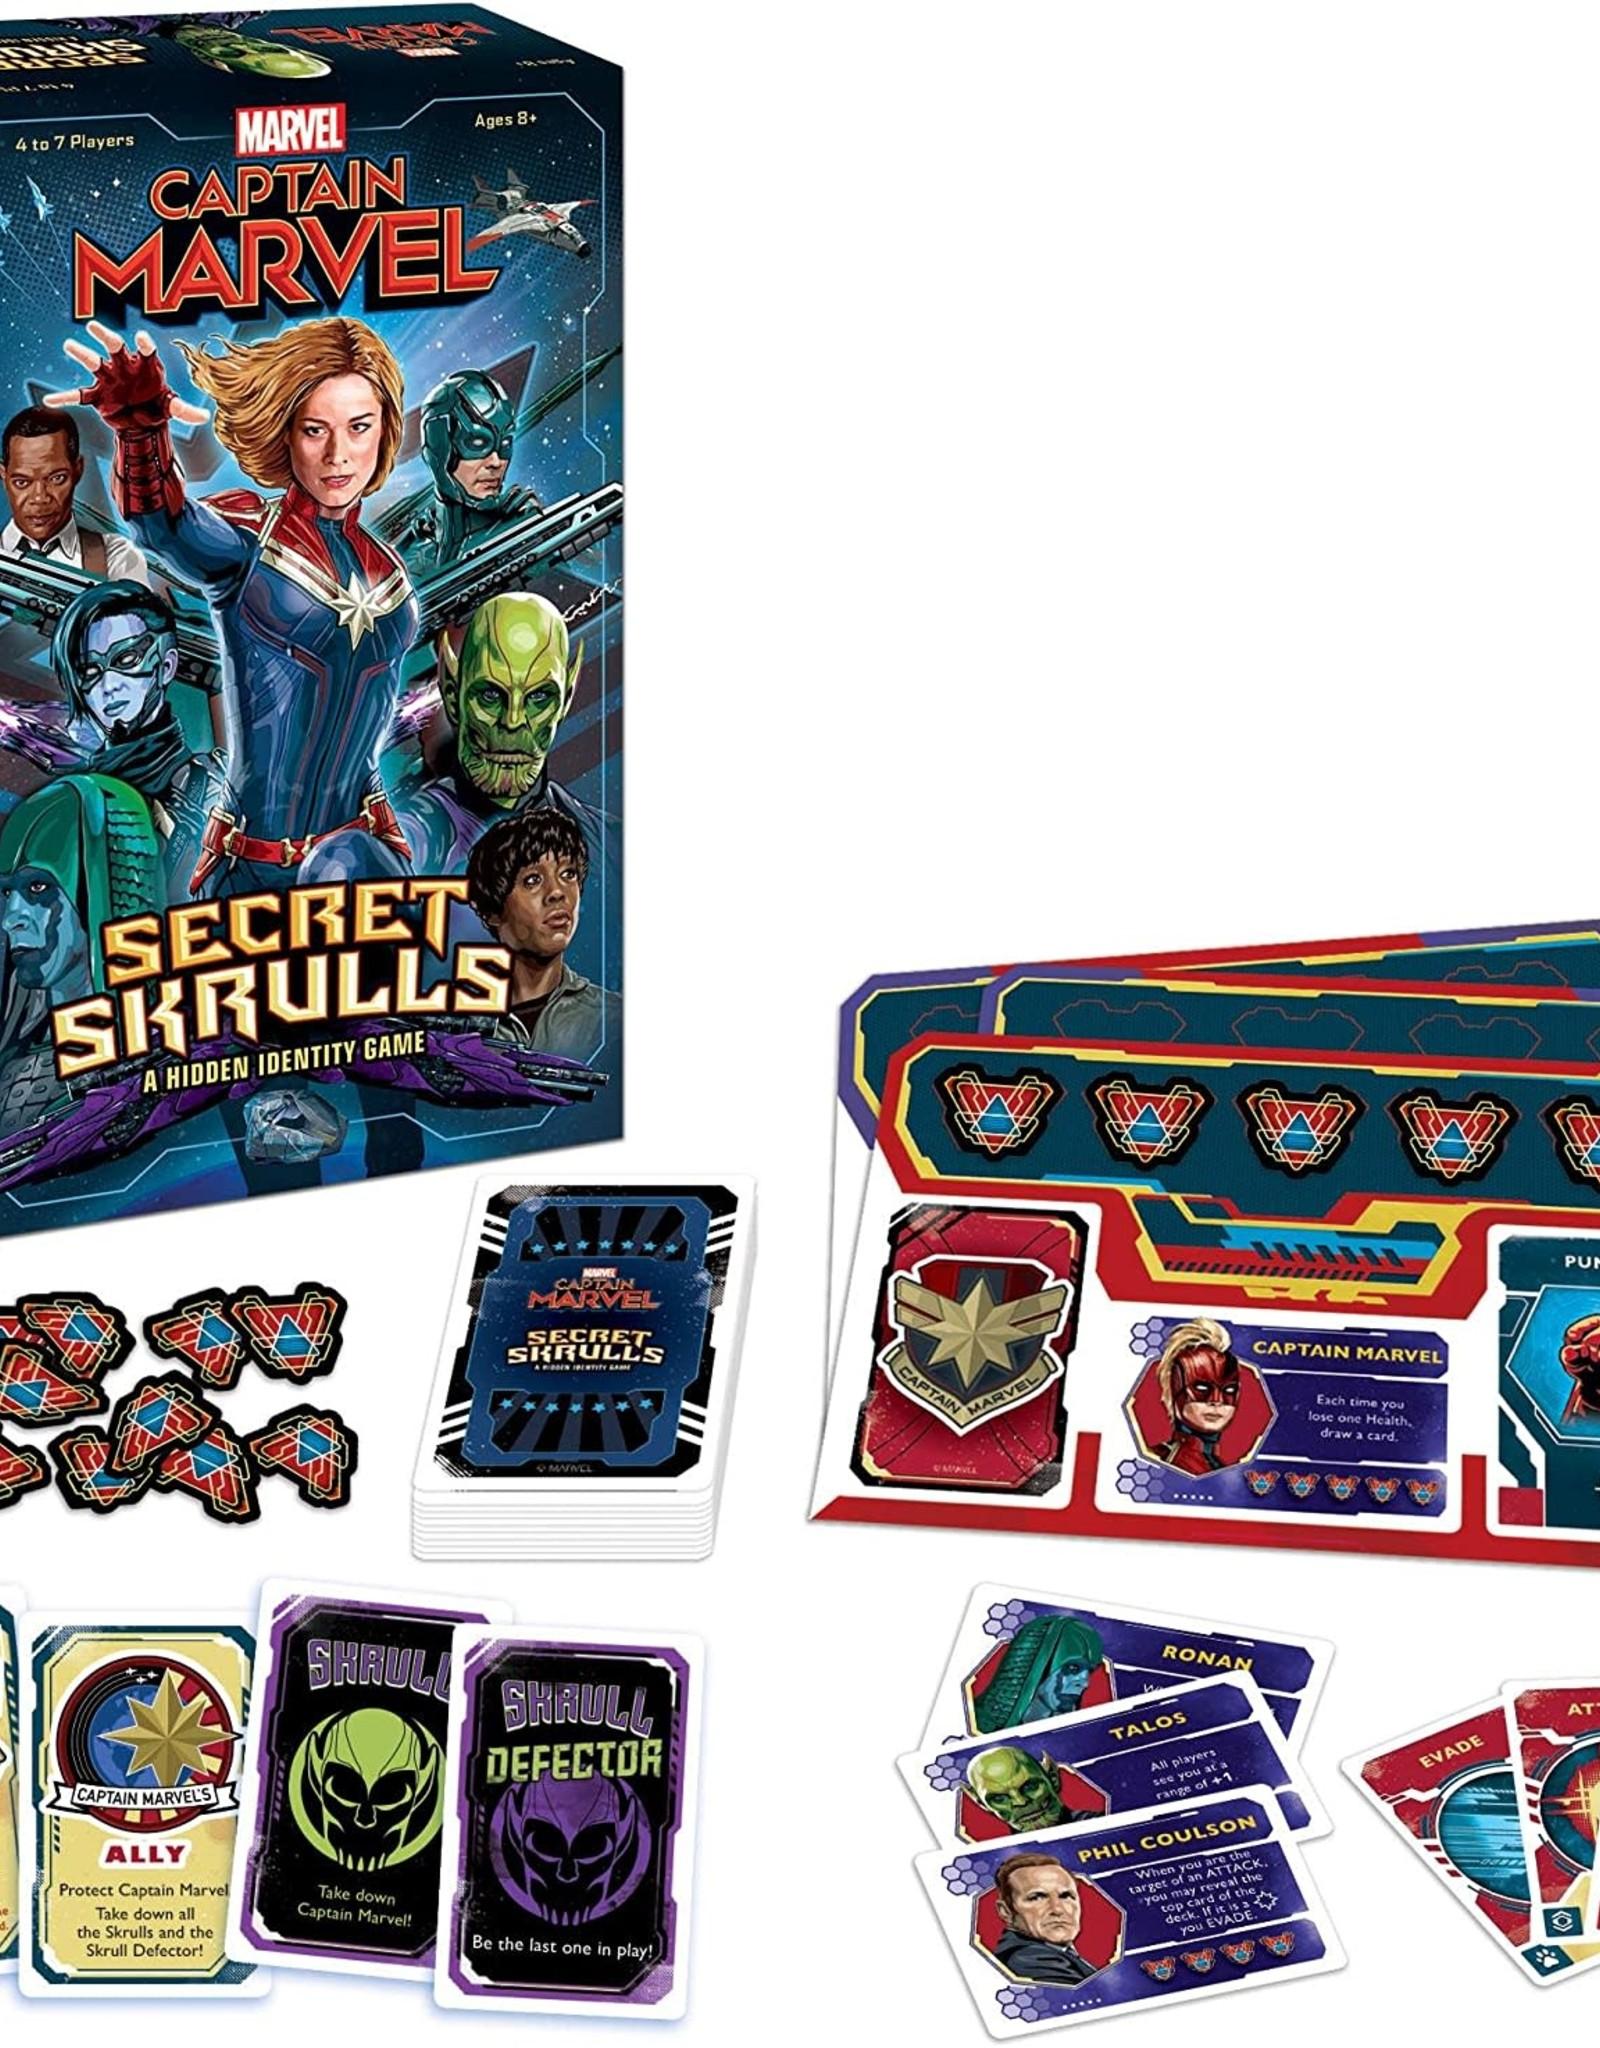 The Op Captain Marvel: Secret Skrulls